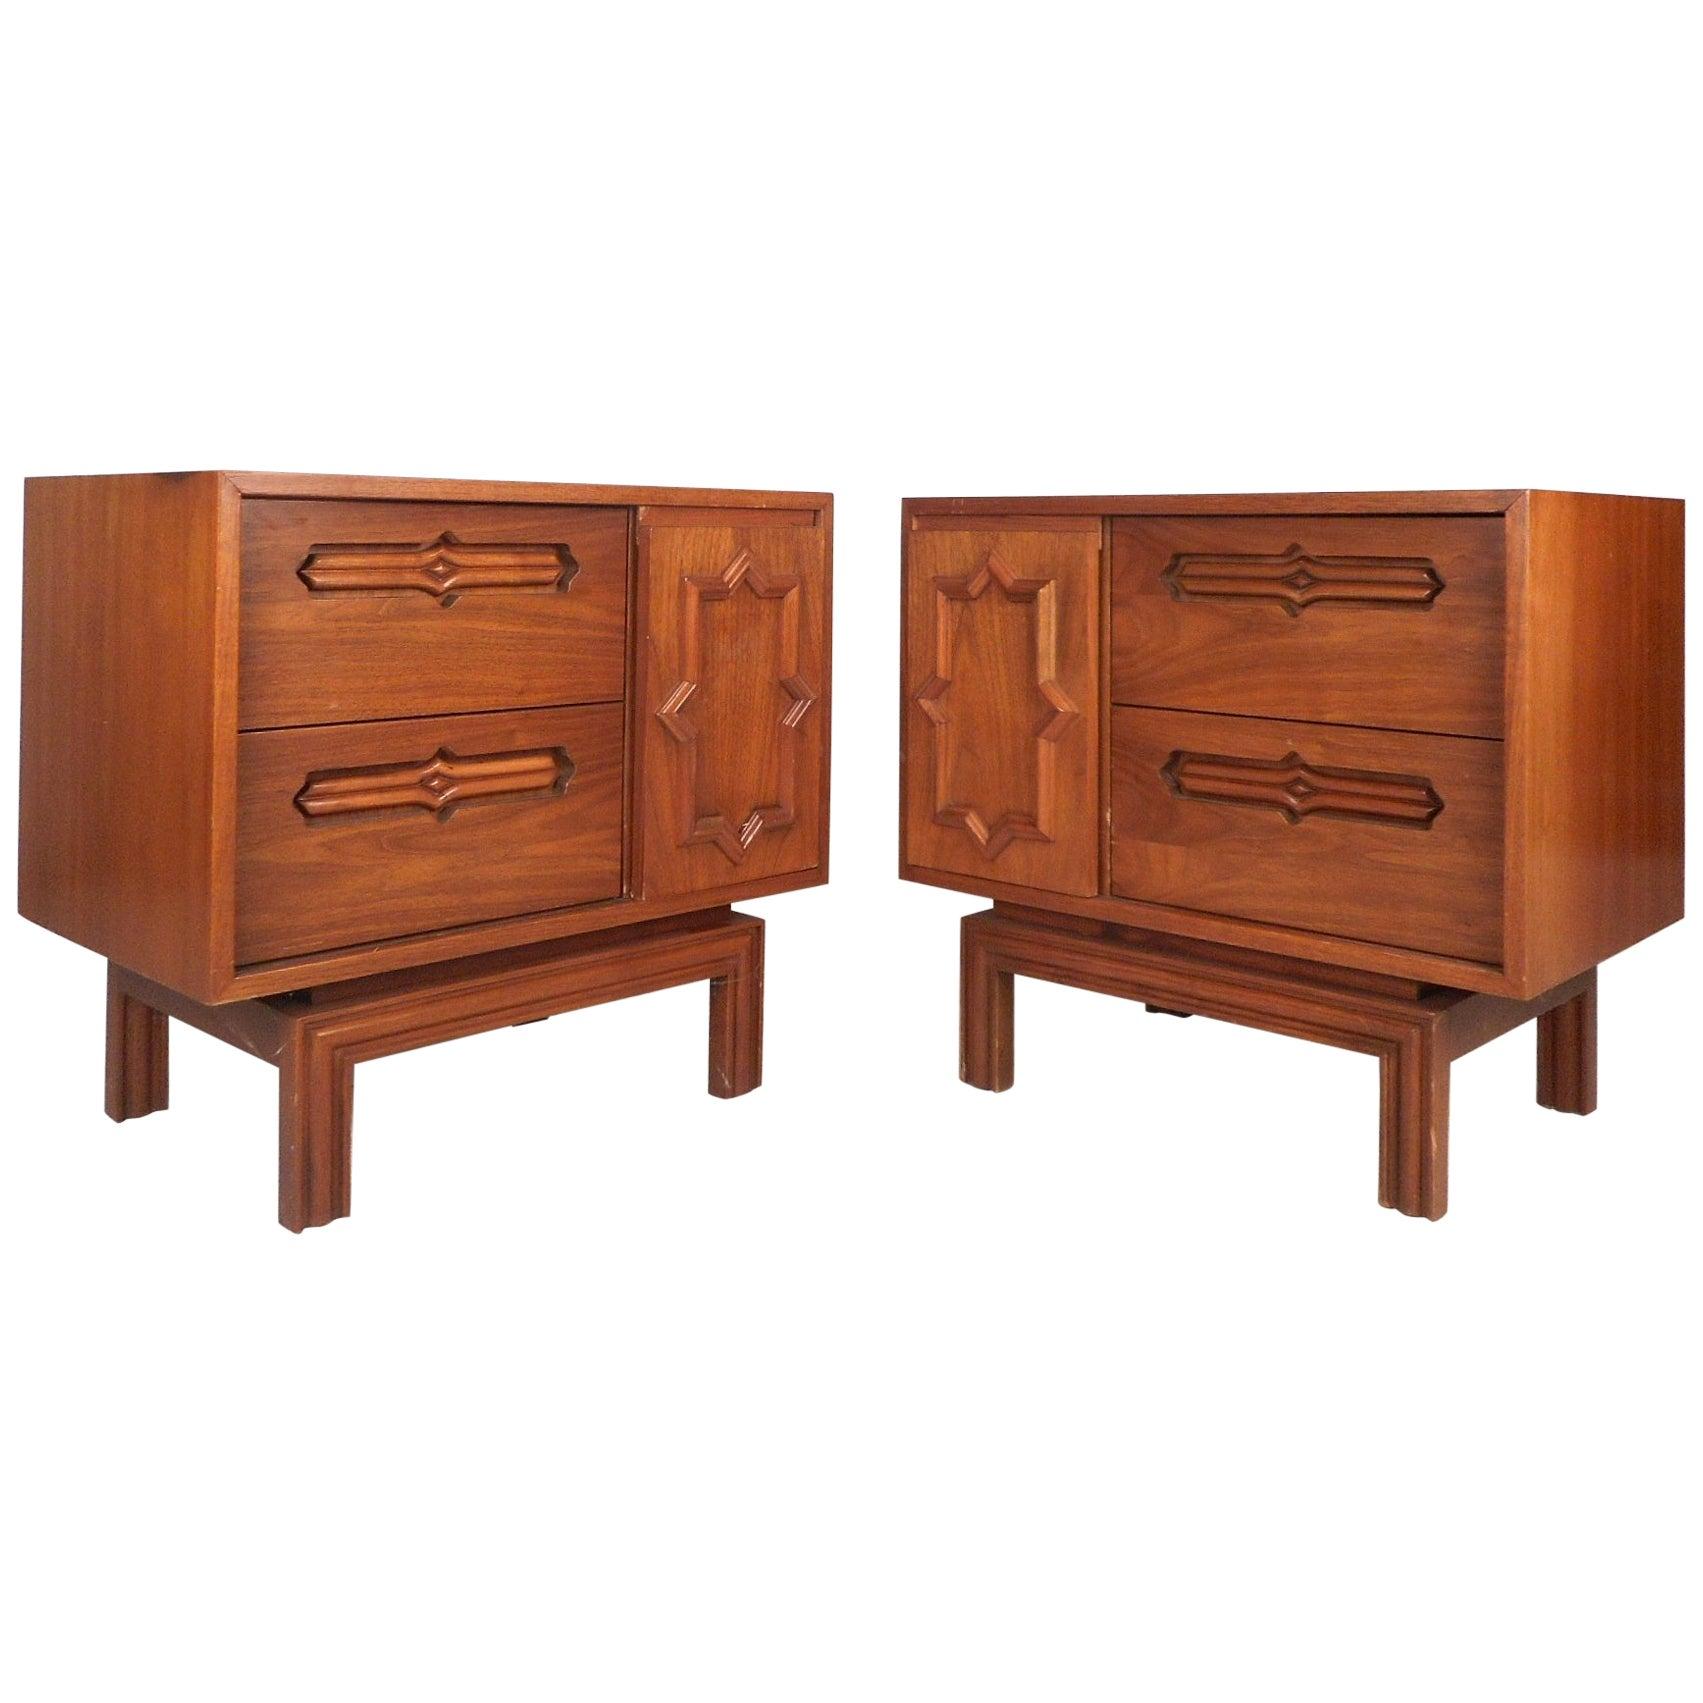 Pair of Mid-Century Modern Walnut Nightstands